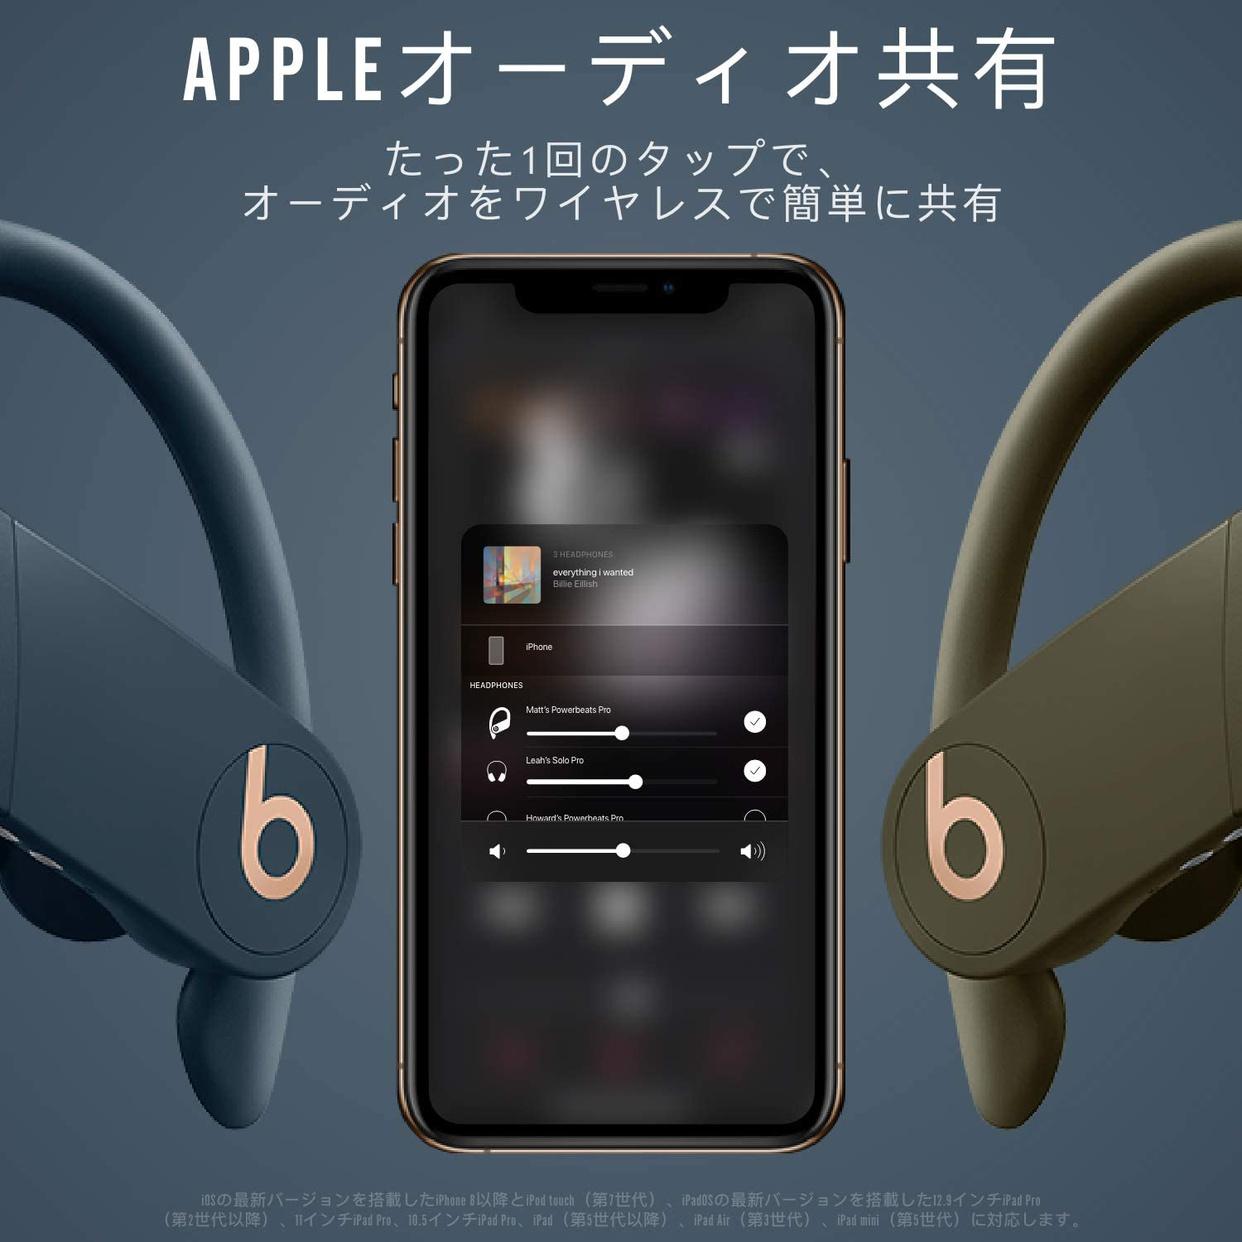 Apple(アップル) Powerbeats Pro-Totallyの商品画像7